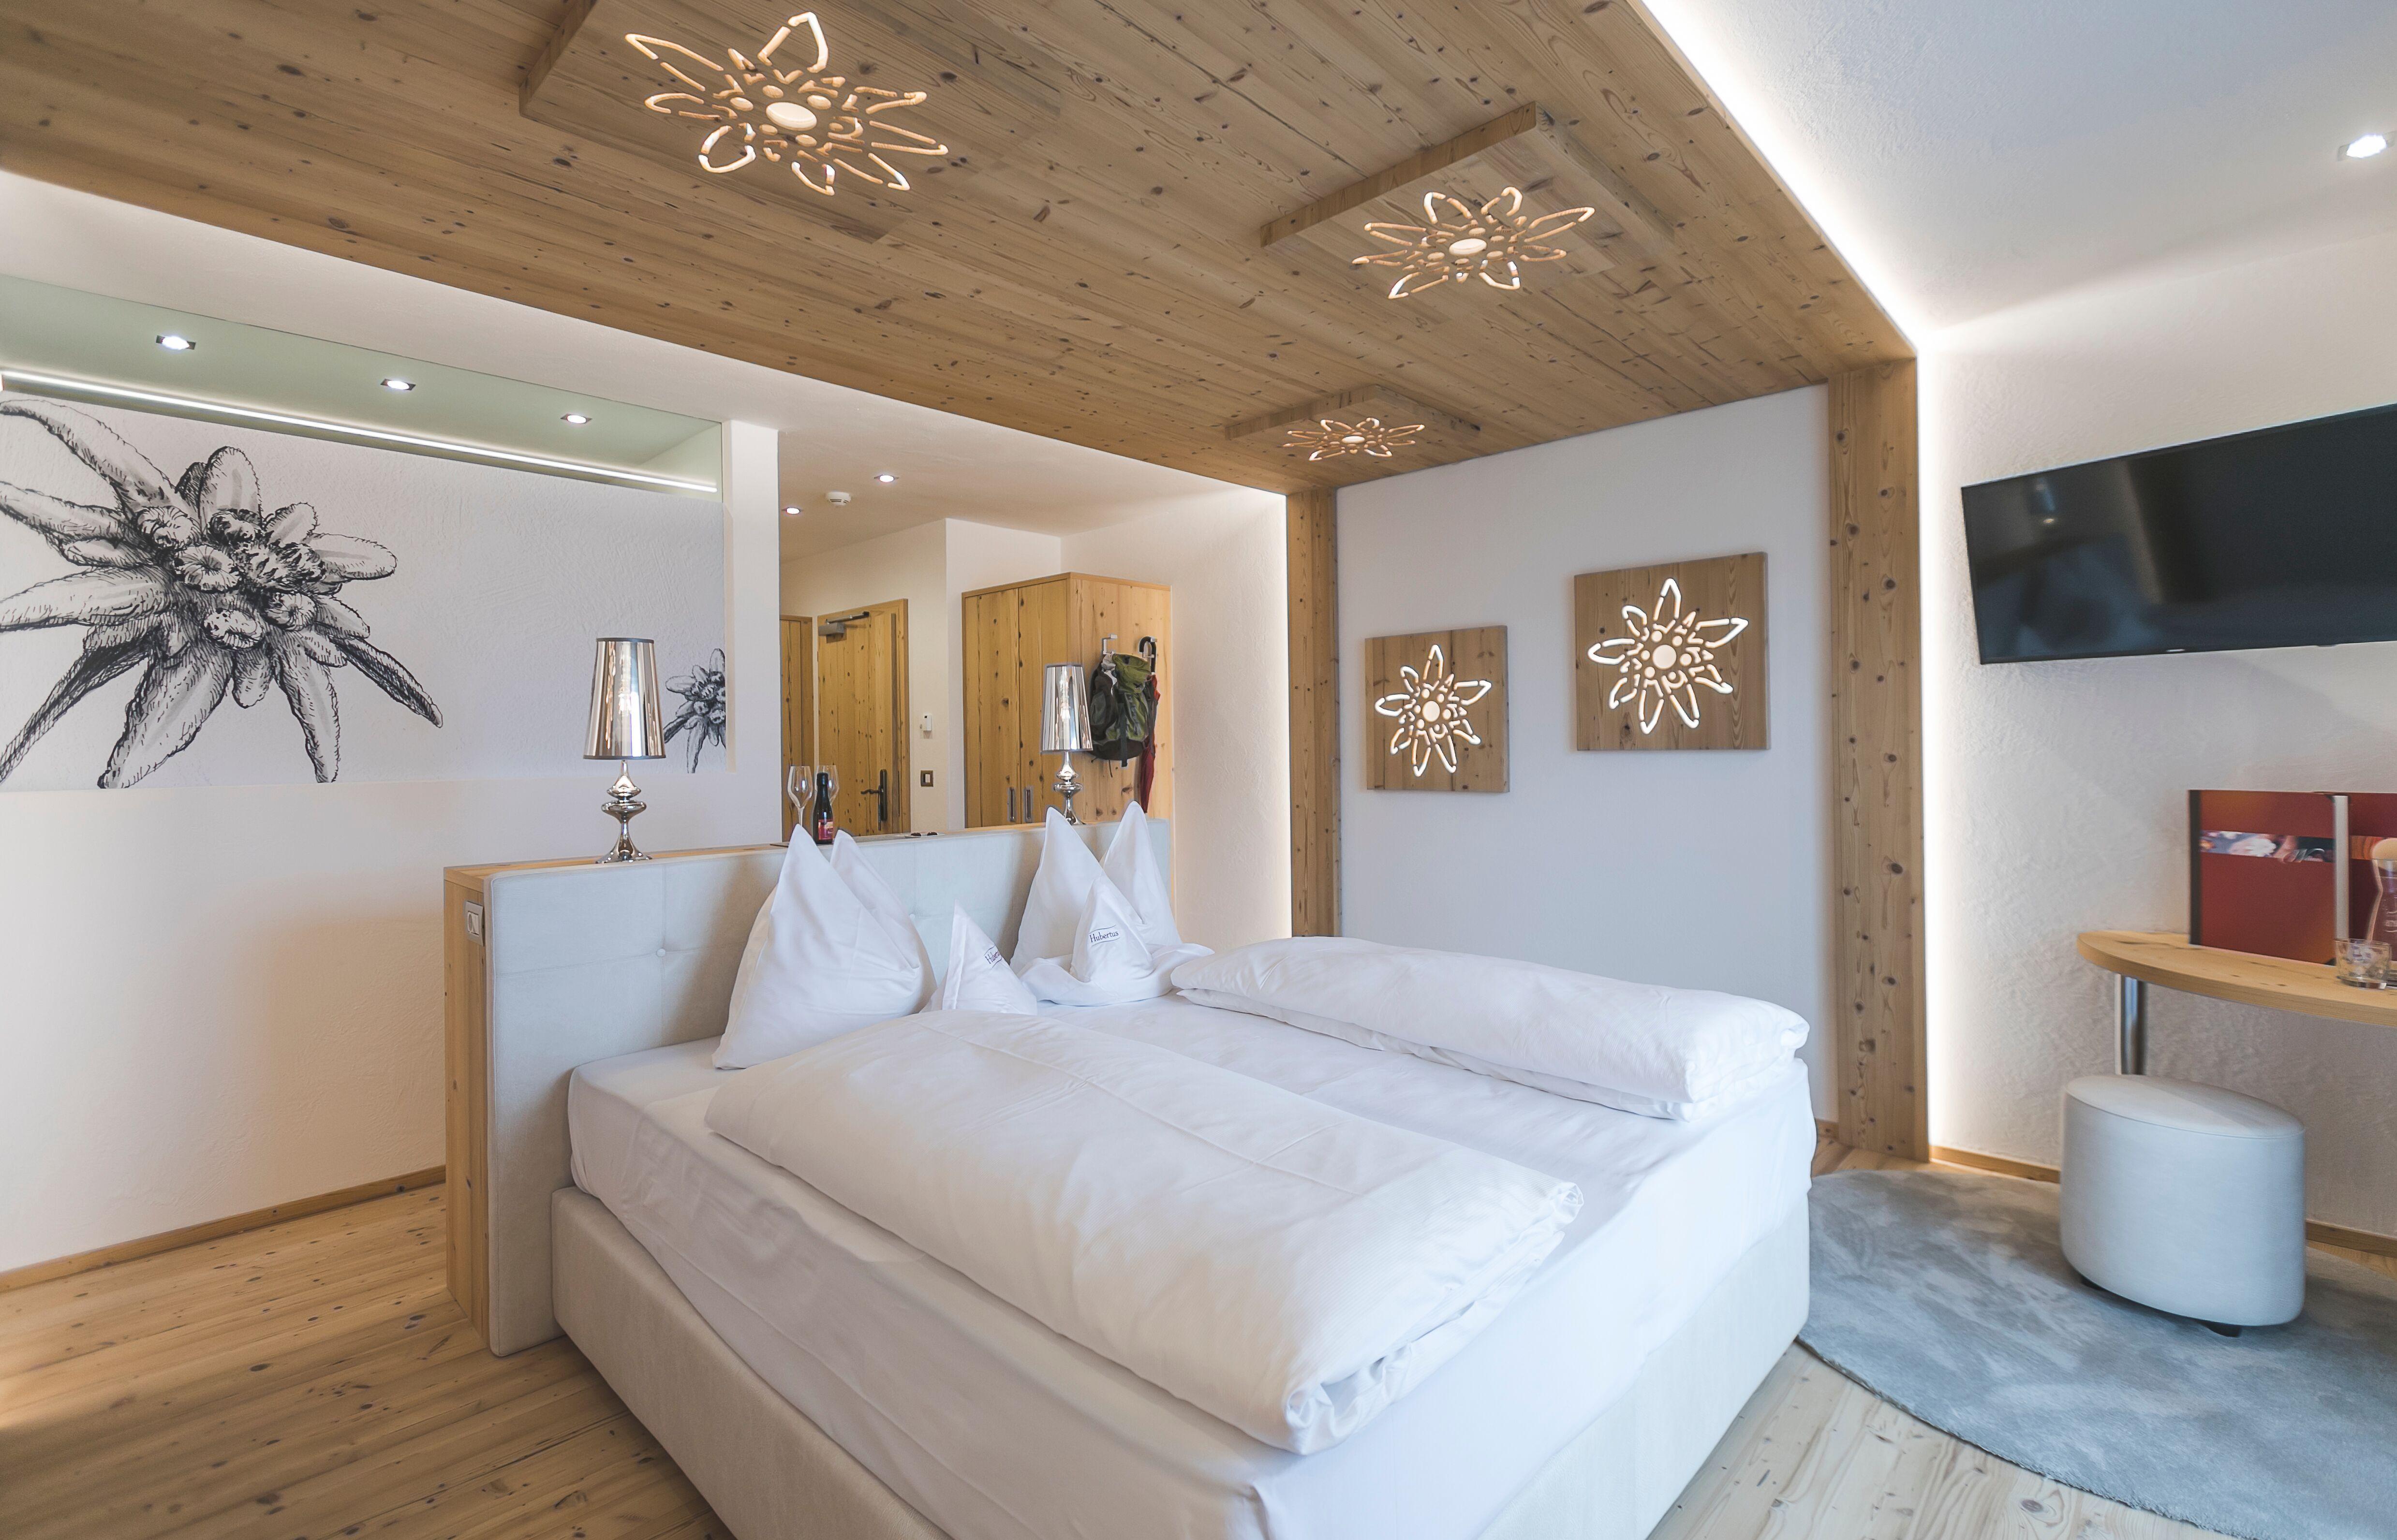 Neue Doppelzimmer Im Alpin Panorama Hotel Hubertus Traumhaft Oder